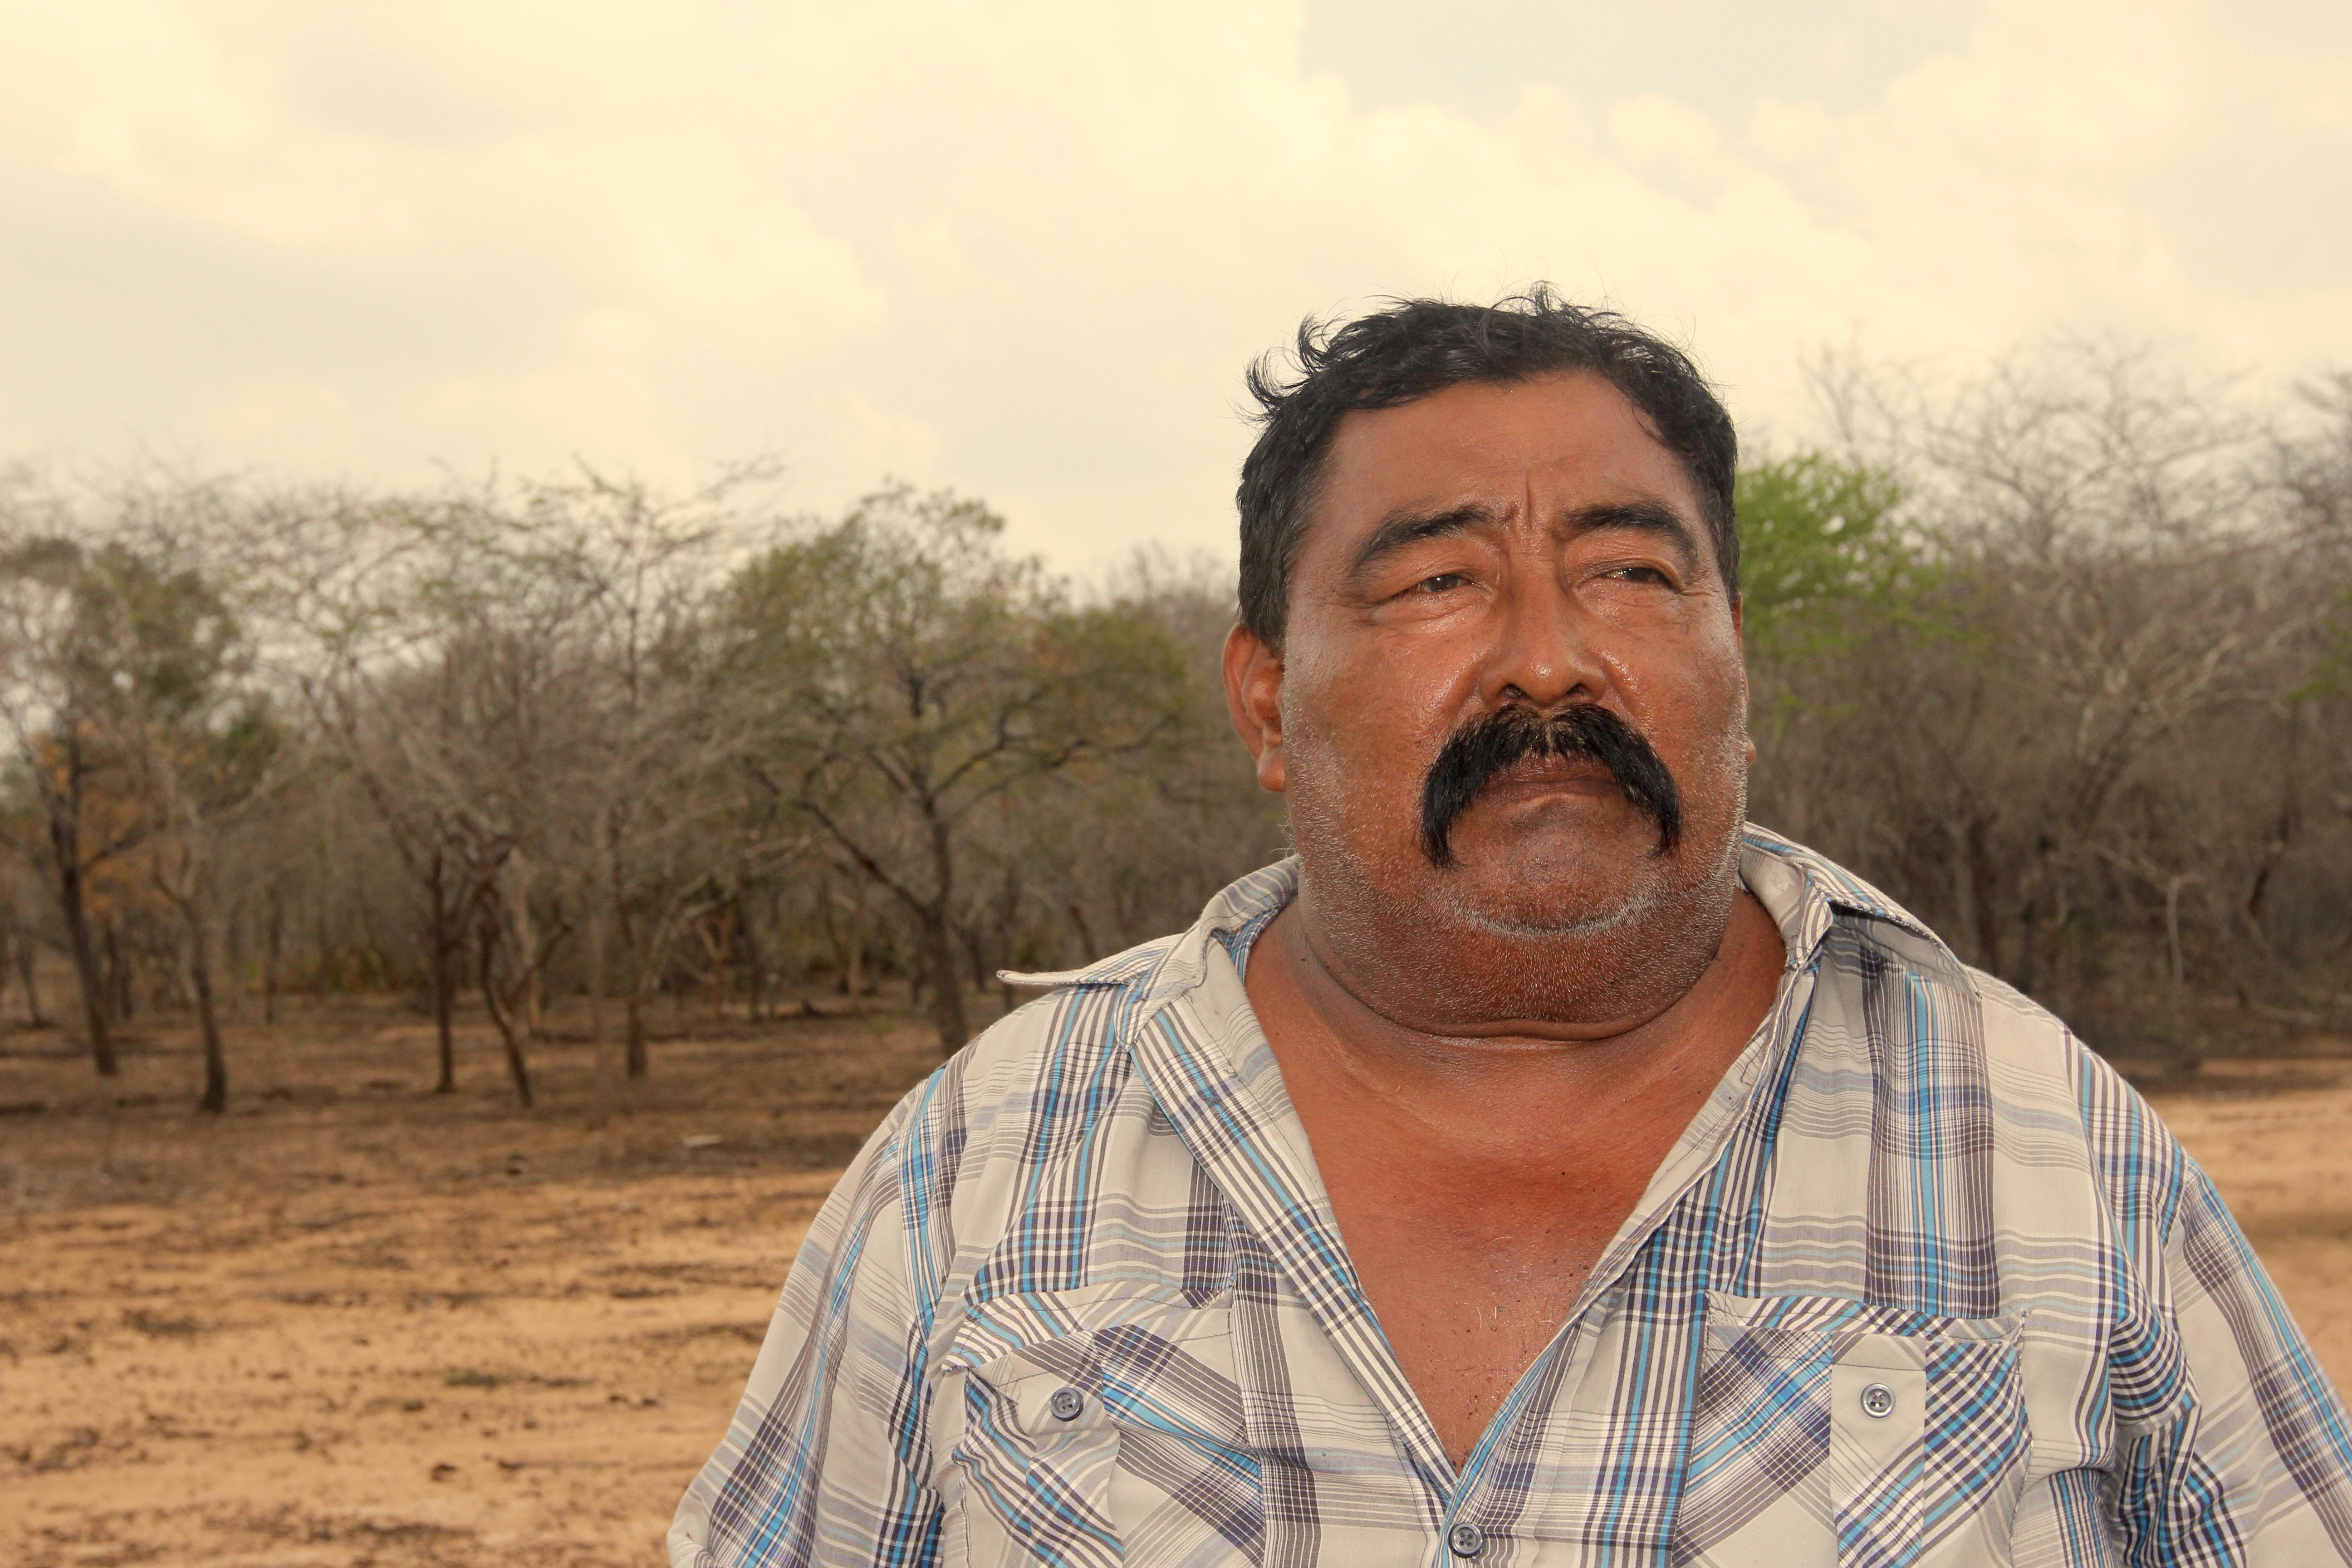 Abram Jose